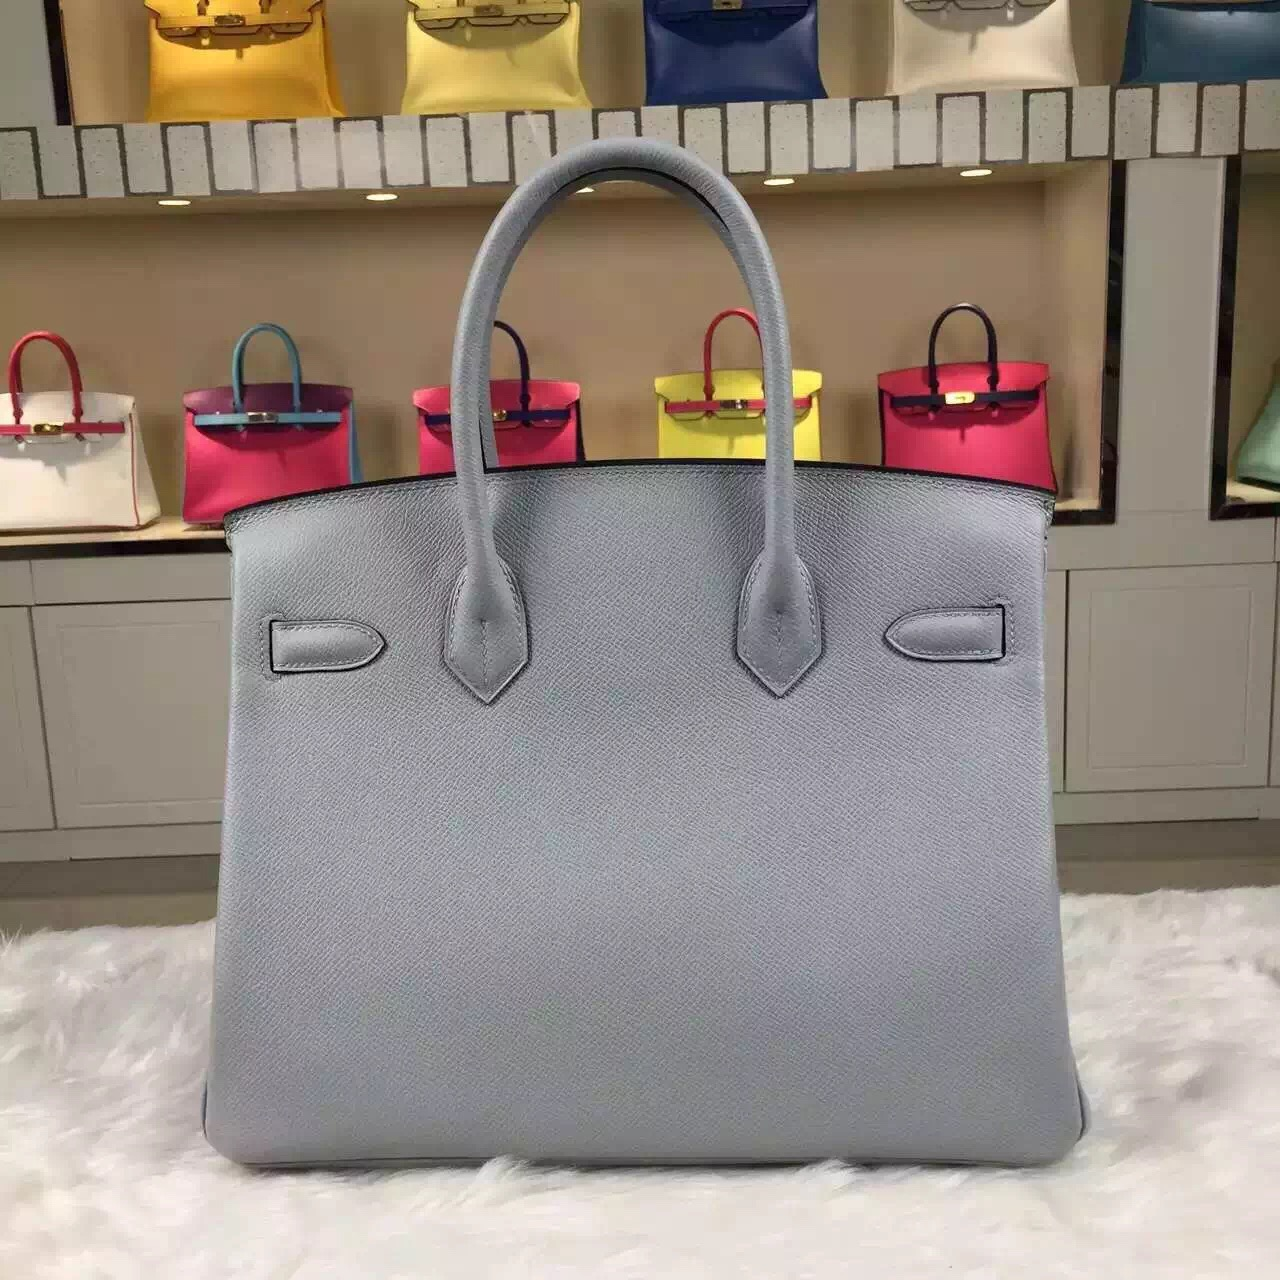 Discount Hermes Epsom Calfskin Leather Birkin30 8U Glacial Blue